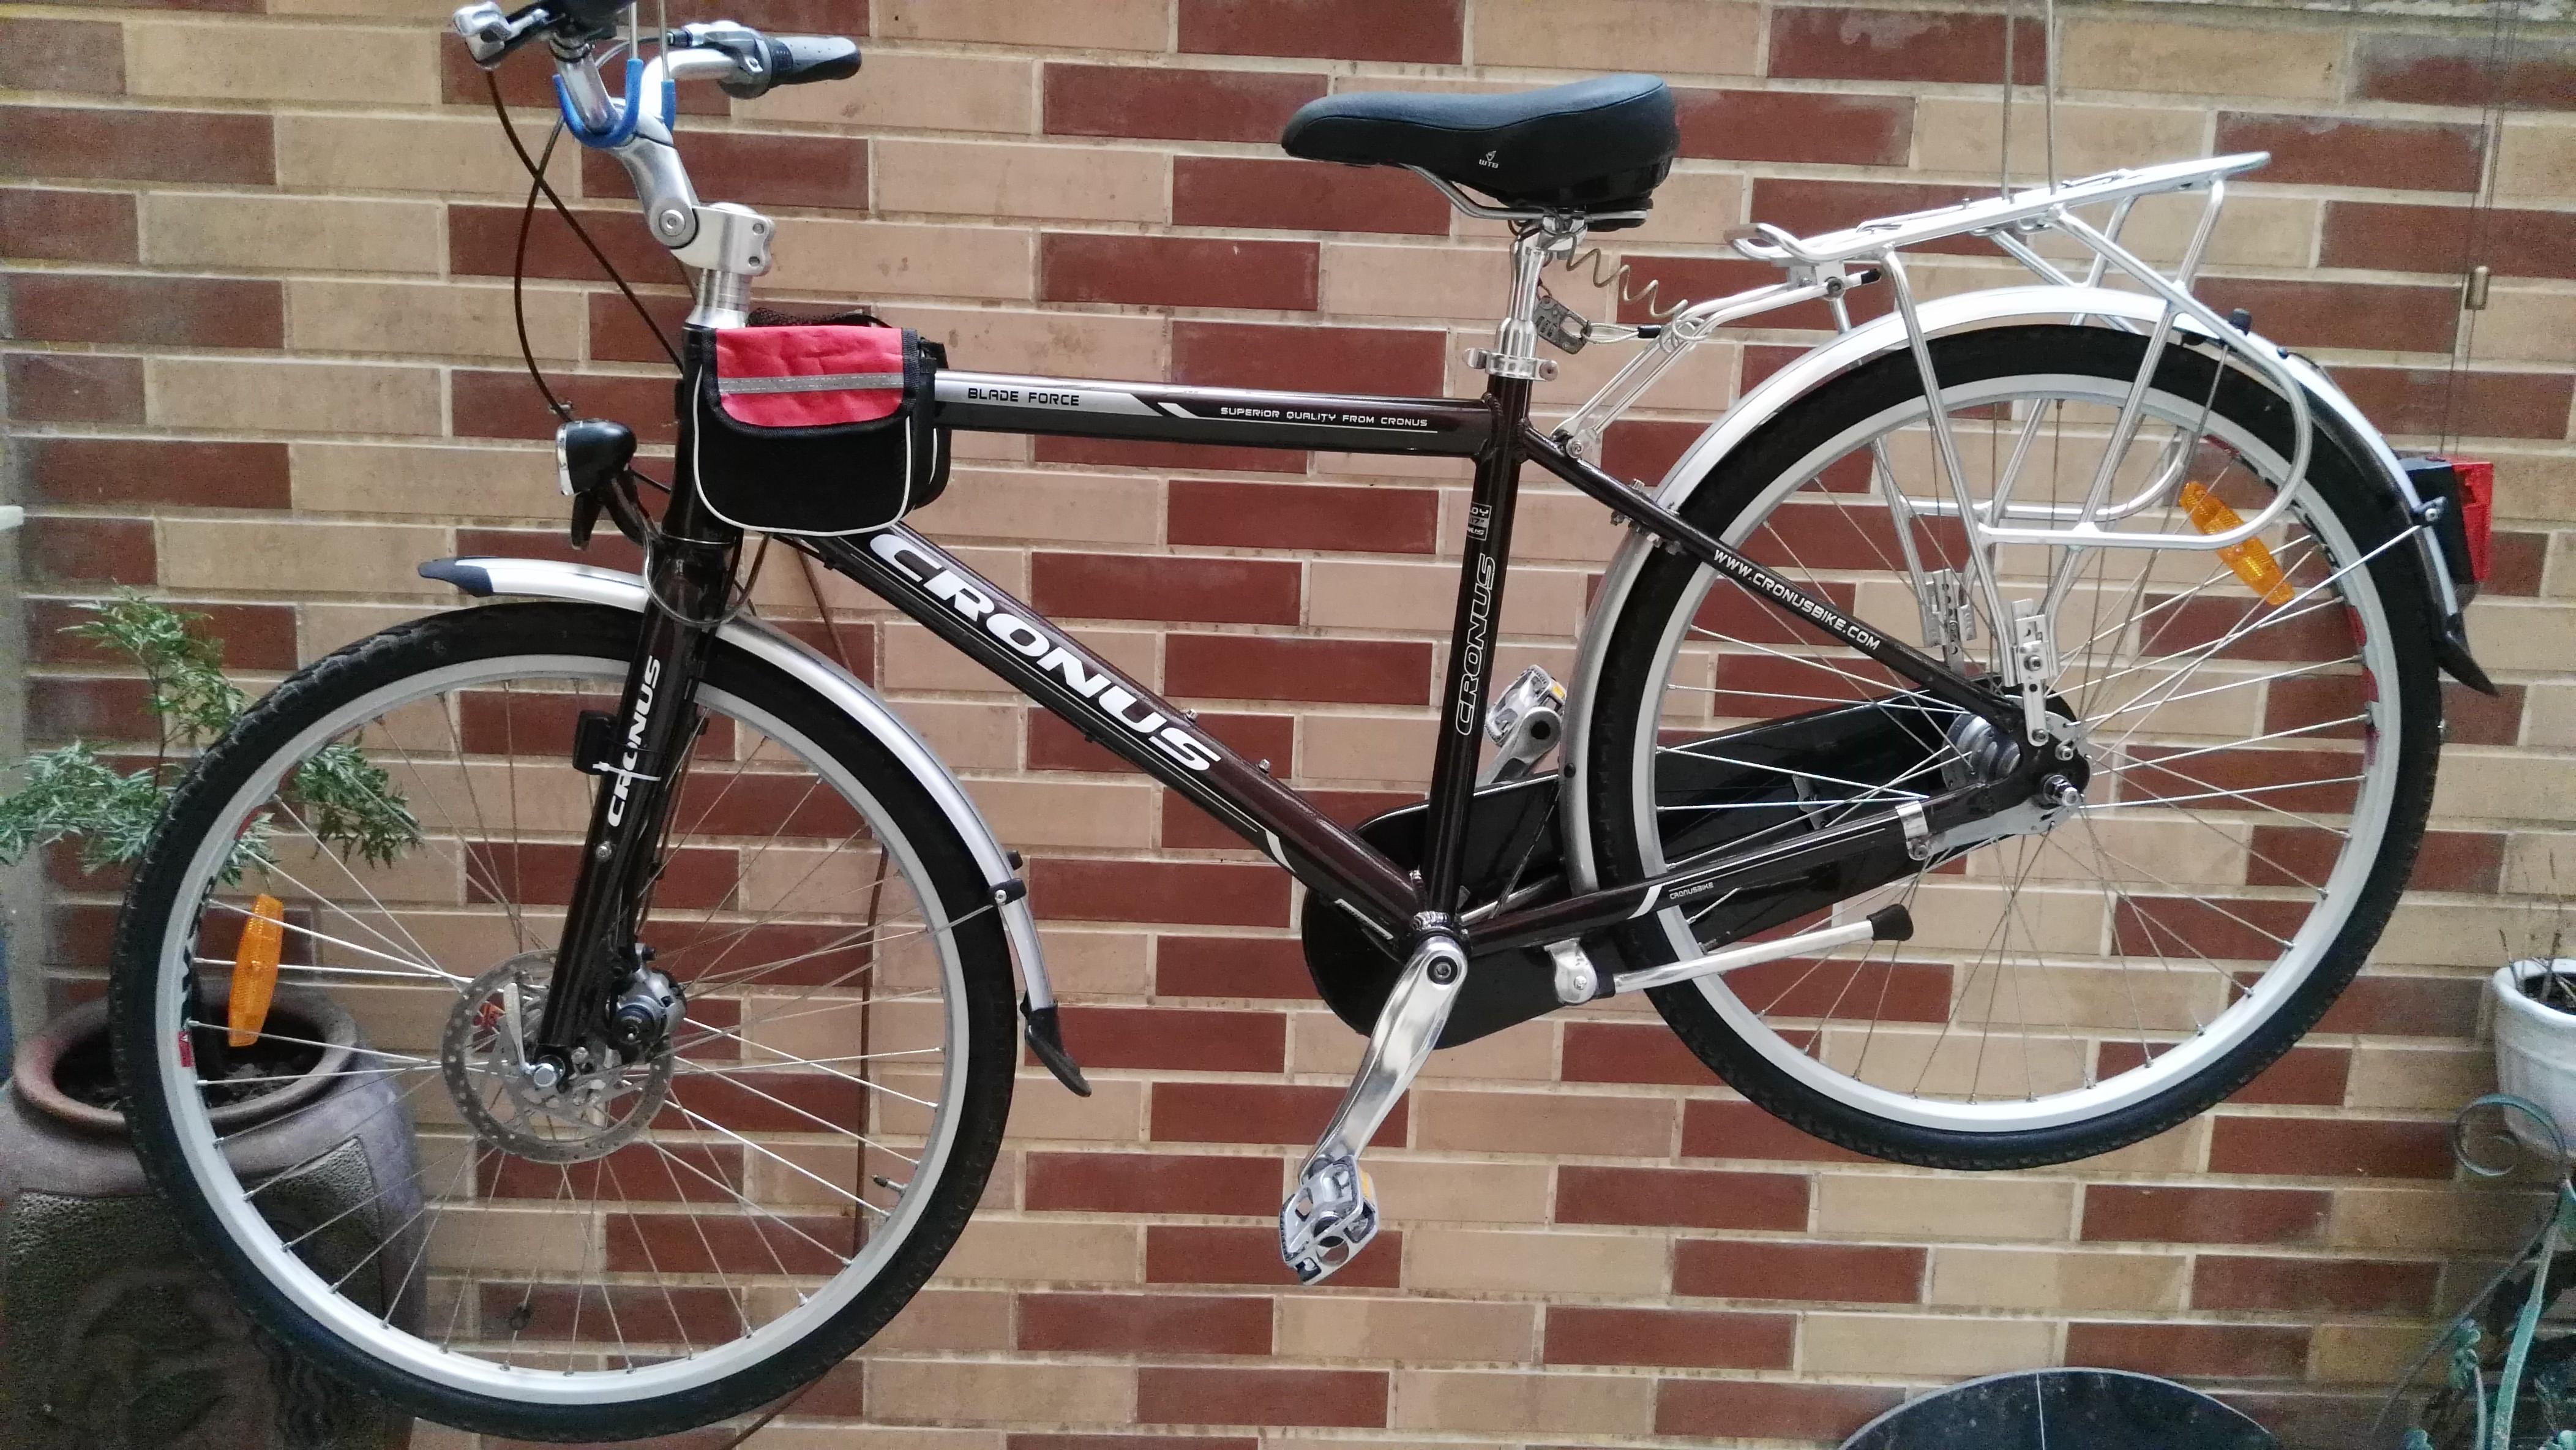 Bán xe đạp Cronus